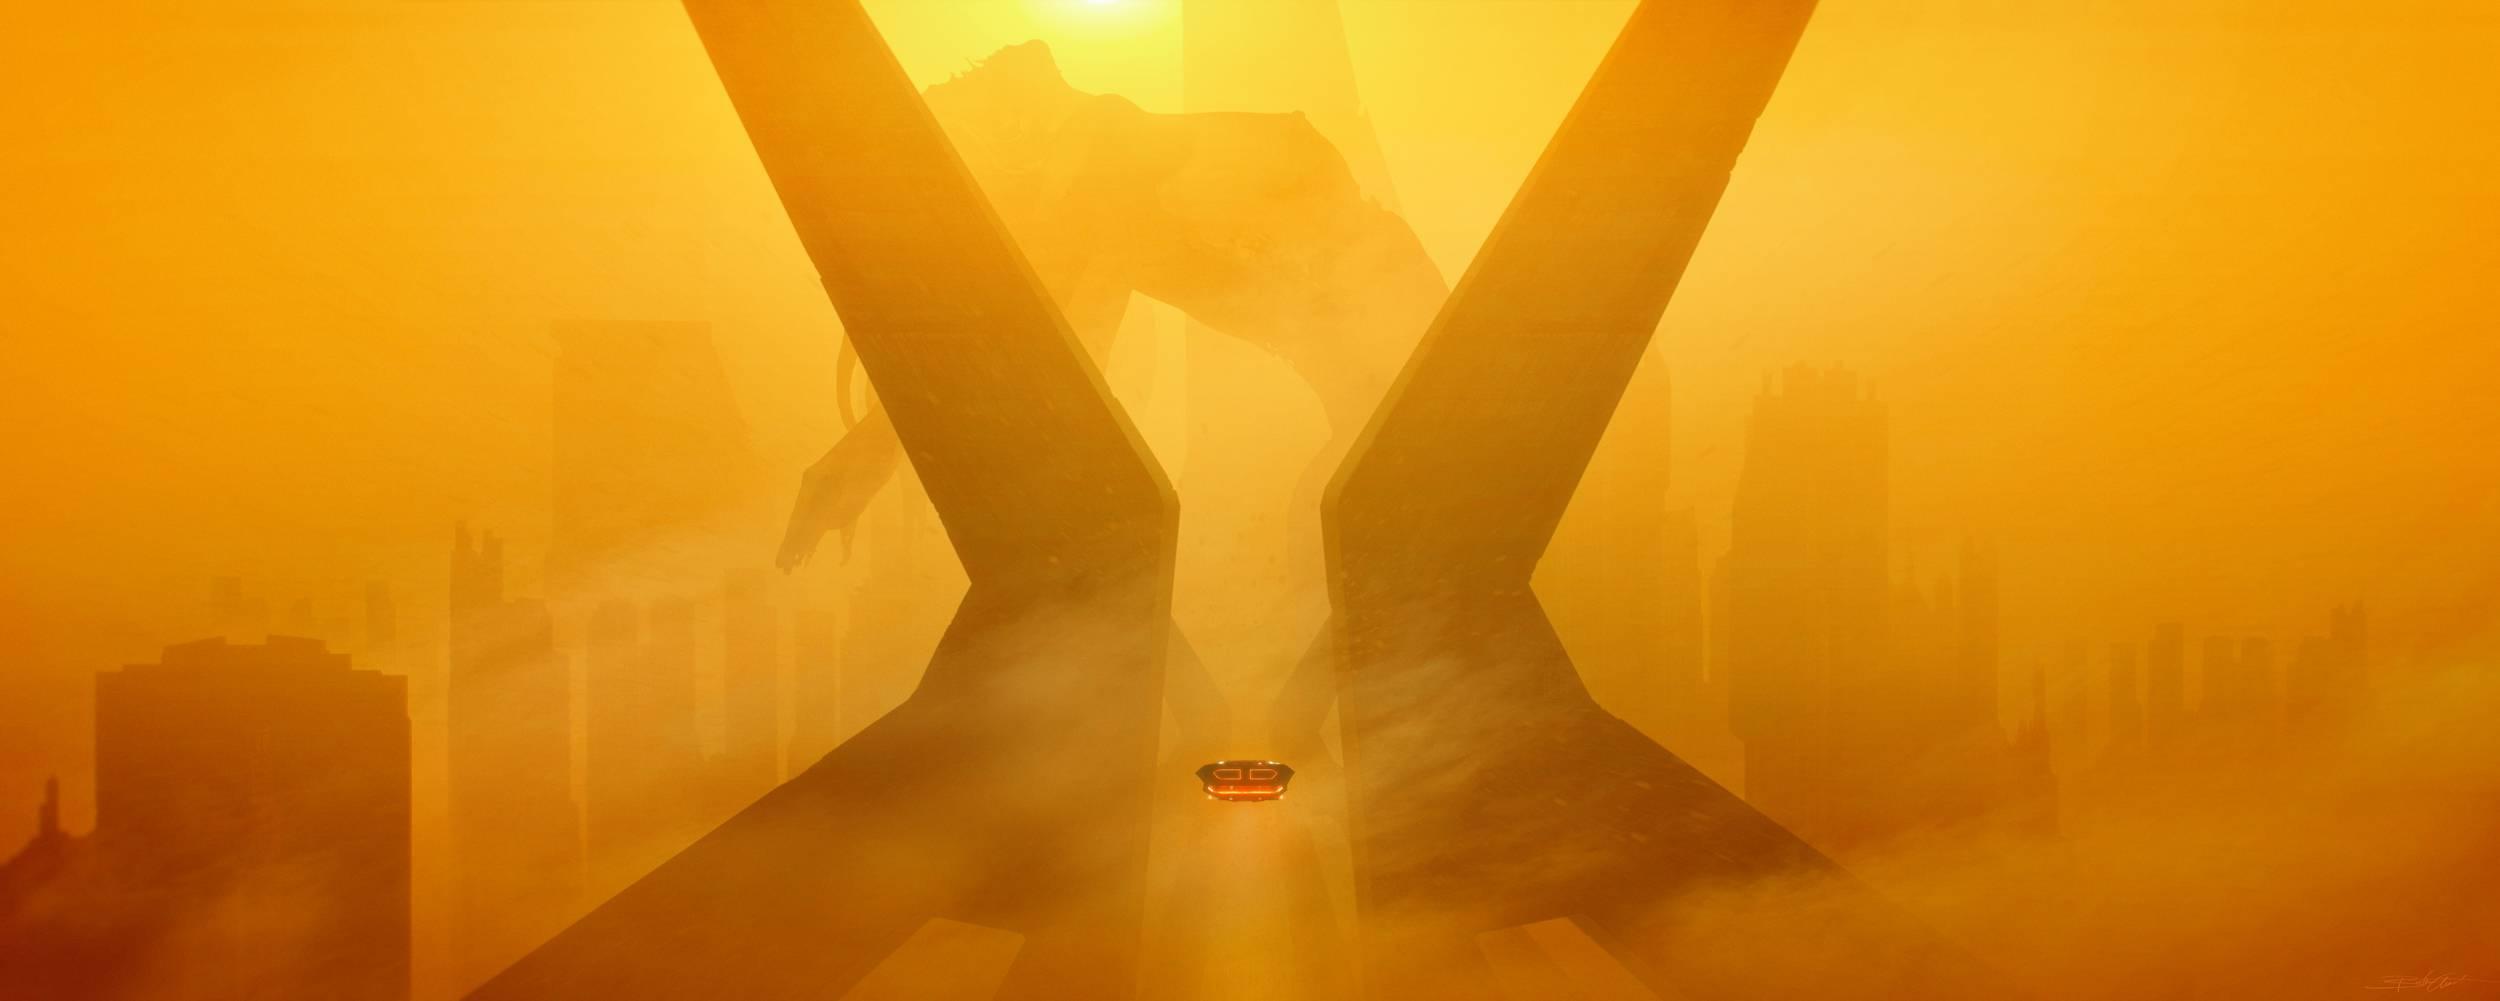 Blade Runner 2049 Fan Artwork Wallpaper